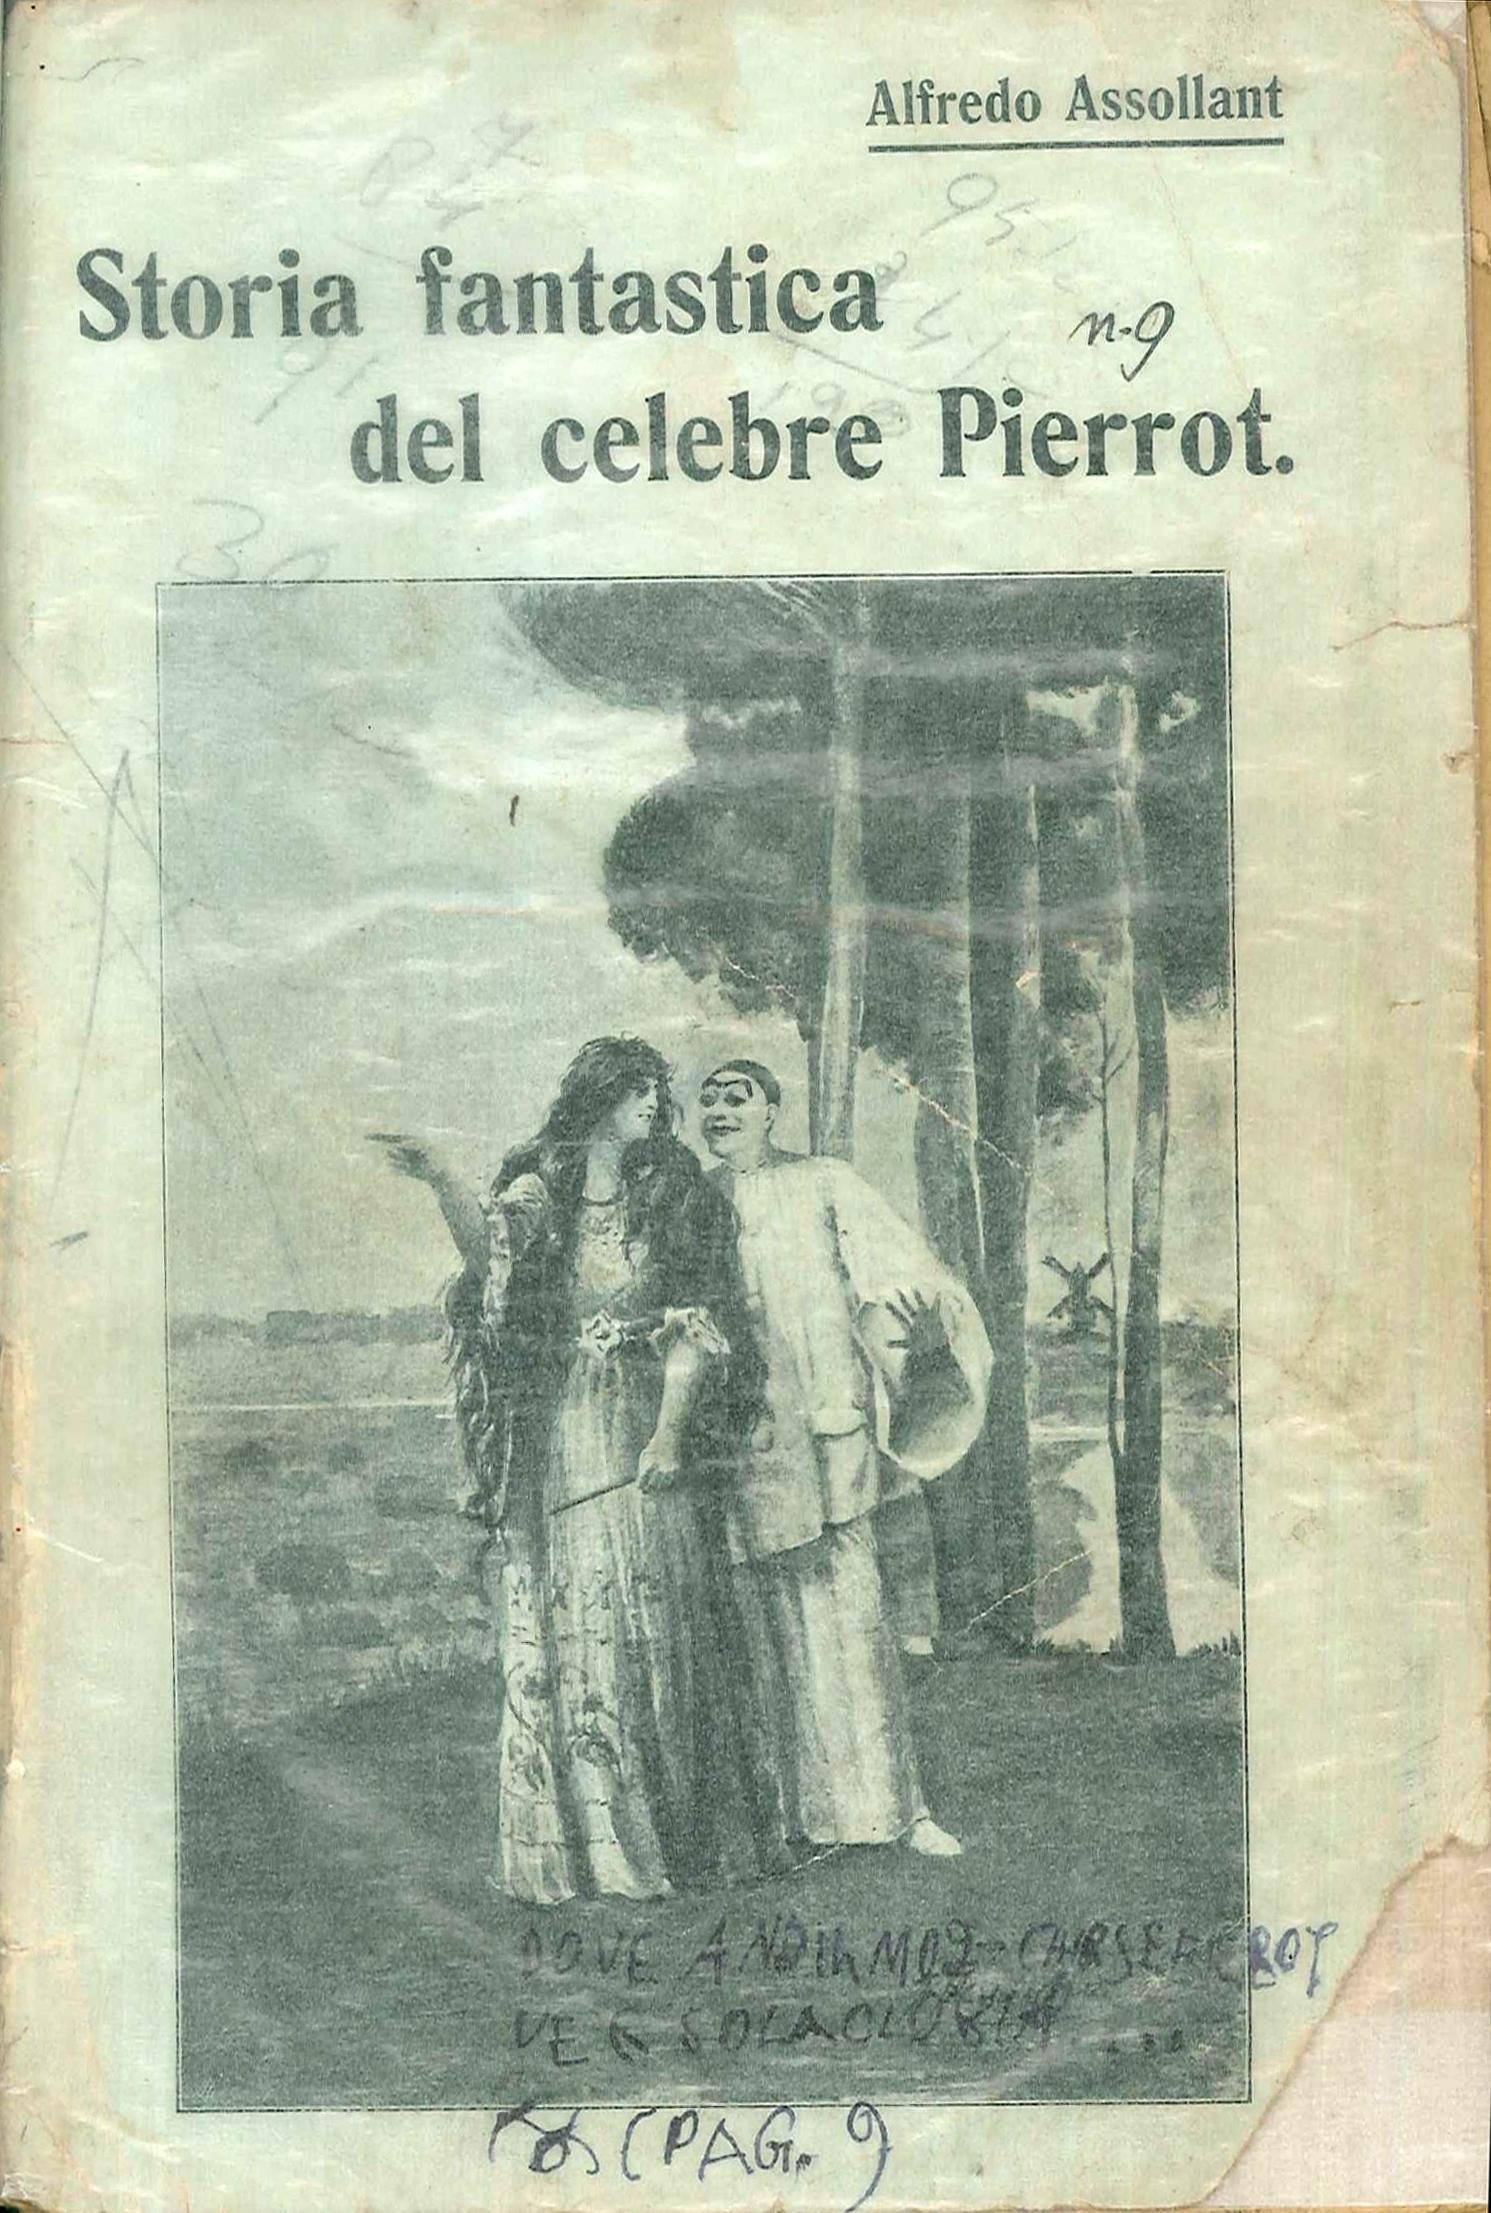 Storia fantastica del celebre Pierrot narrata dal mago Alcofribas